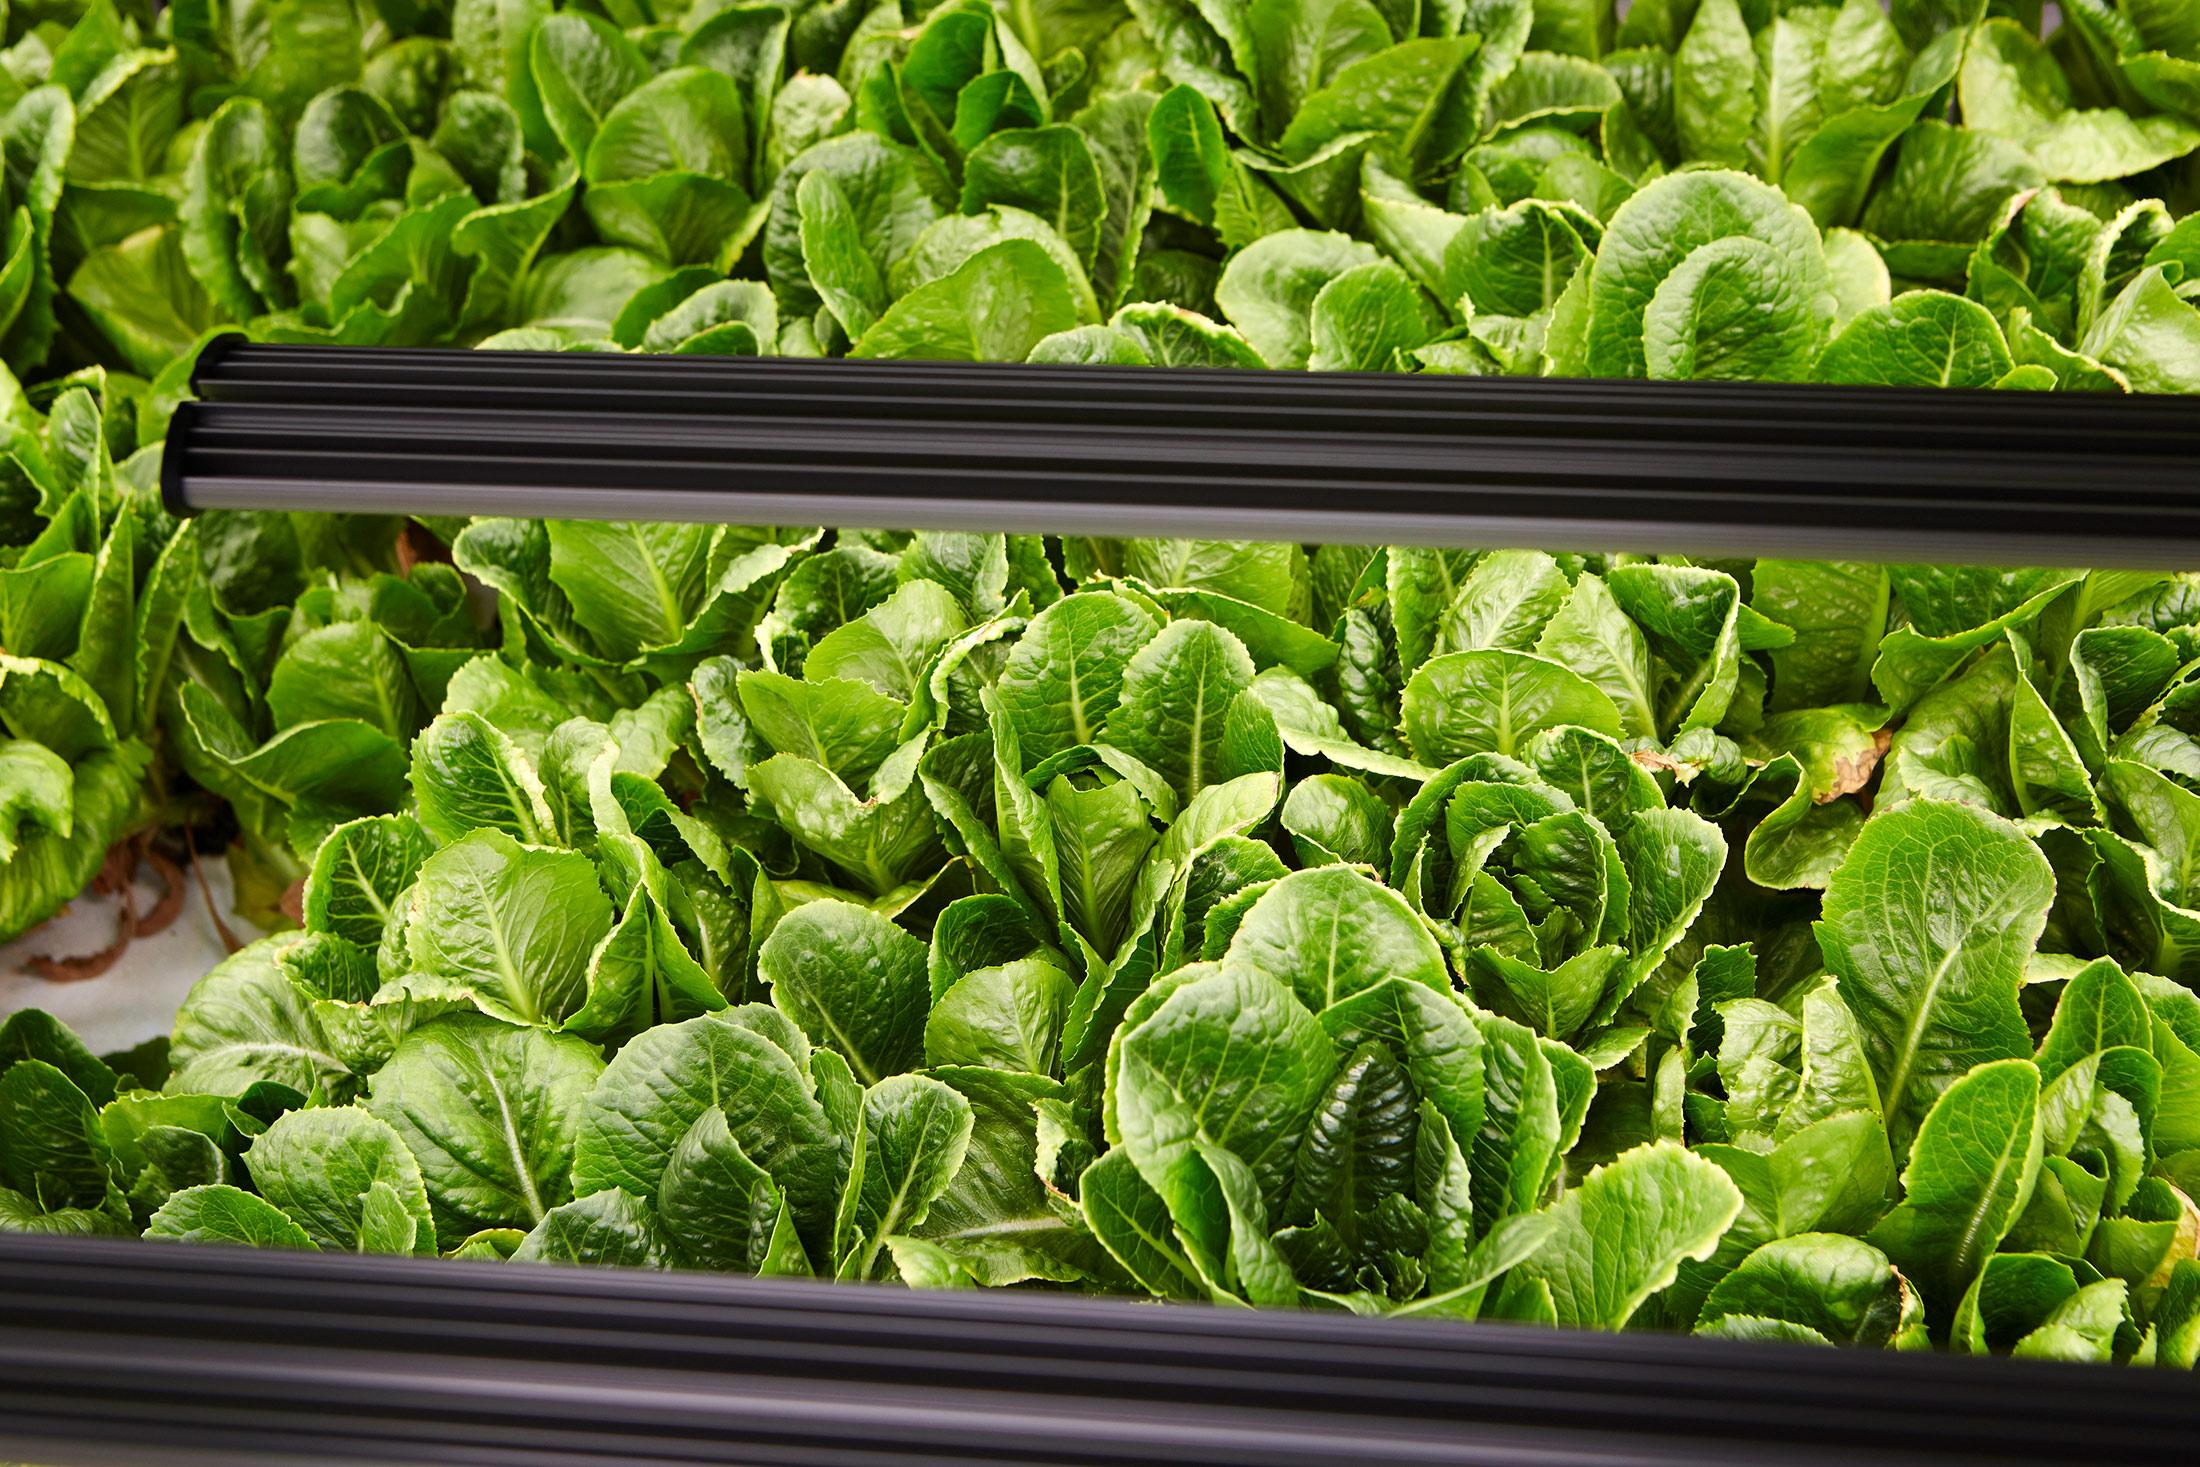 An Amazon Veteran Joins Indoor Farming Startup - Bloomberg